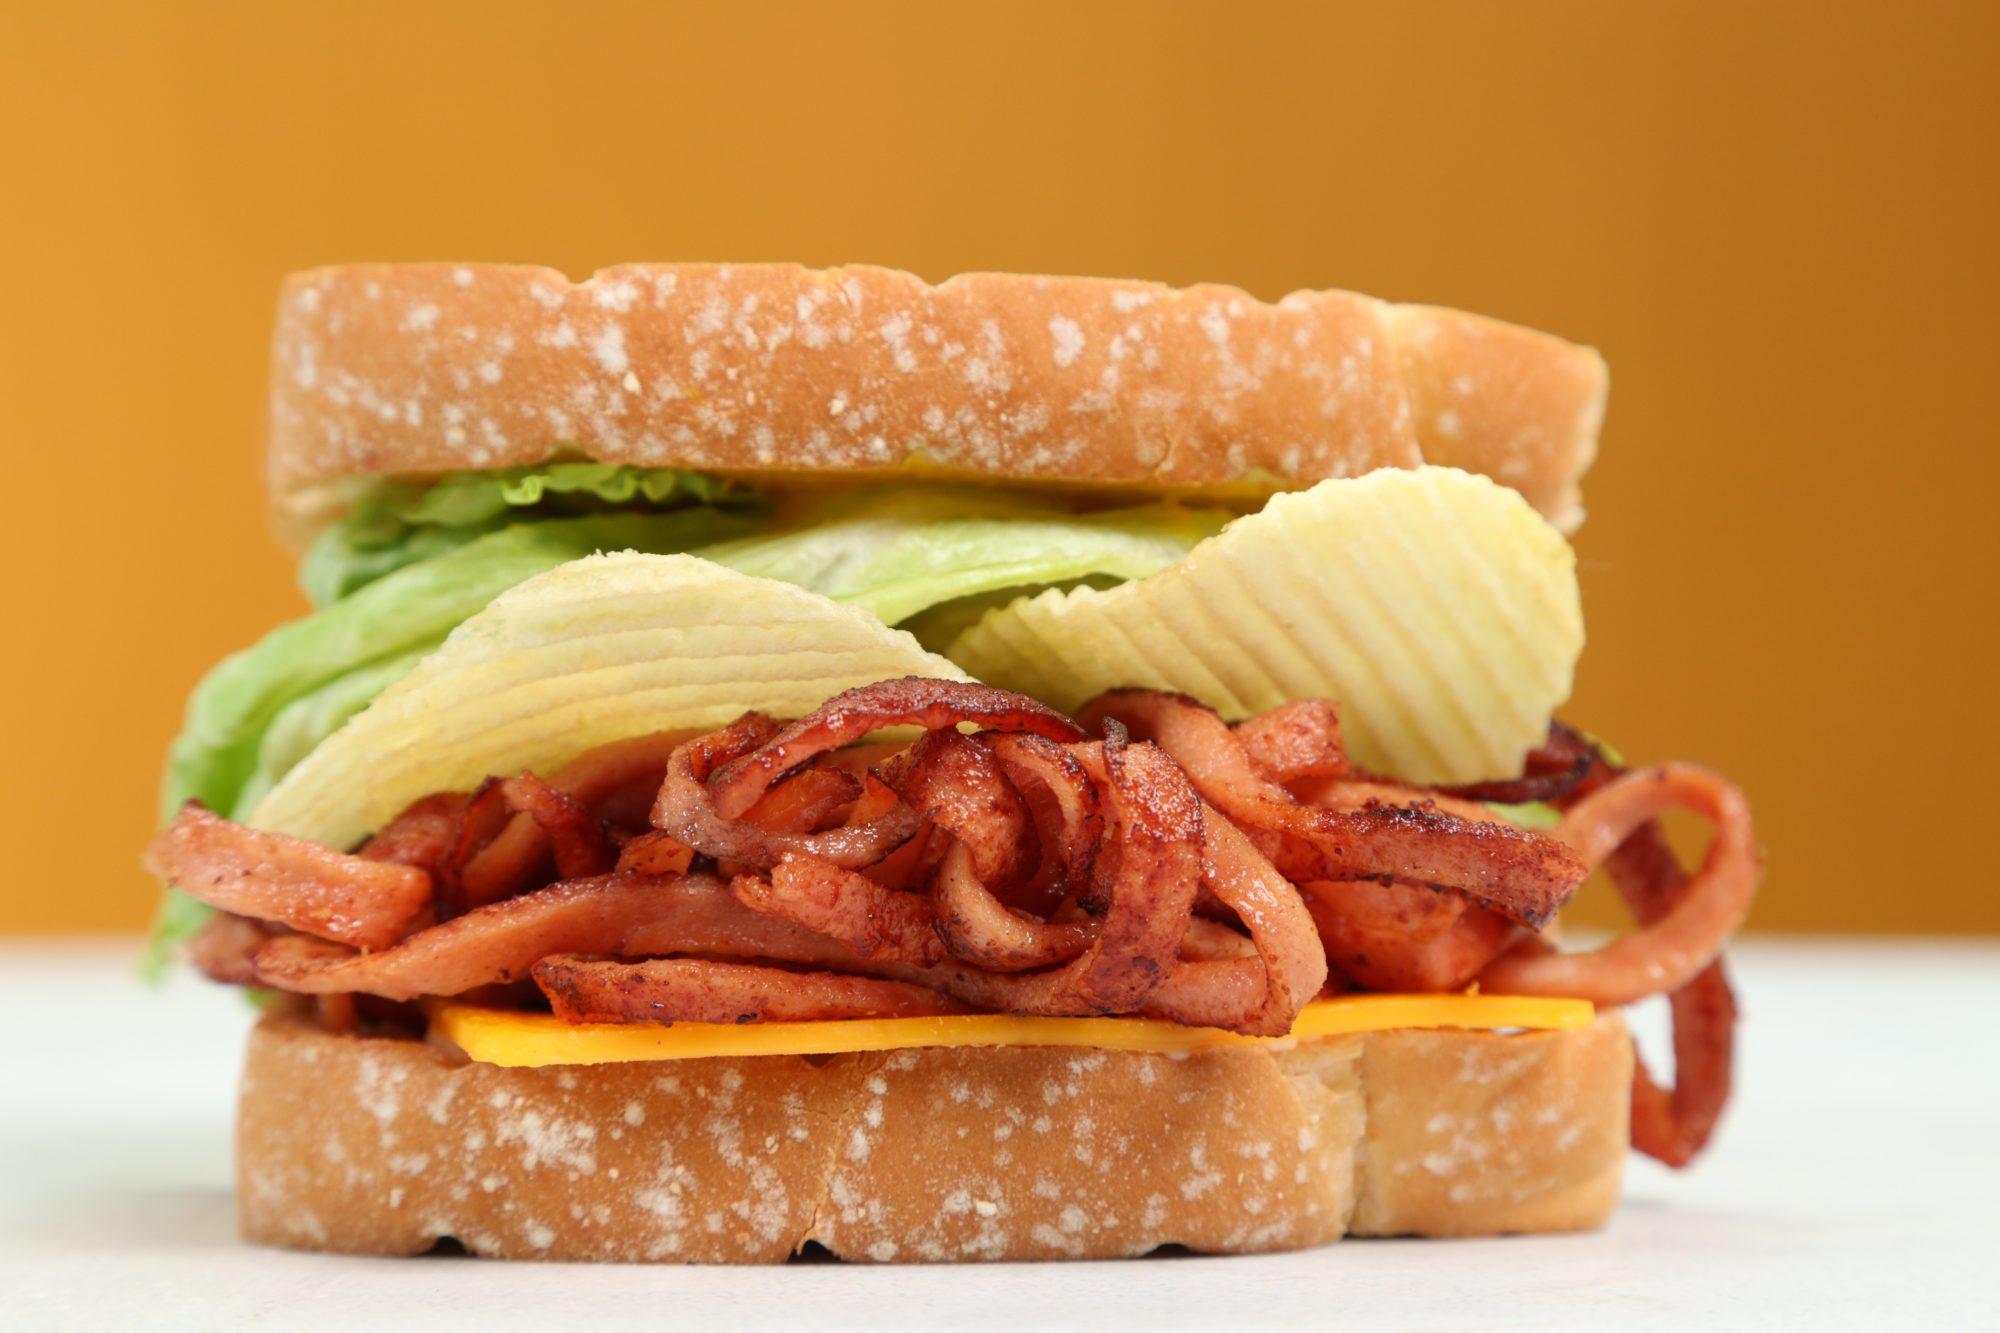 rilievi fonometrici bologna sandwich - photo#5